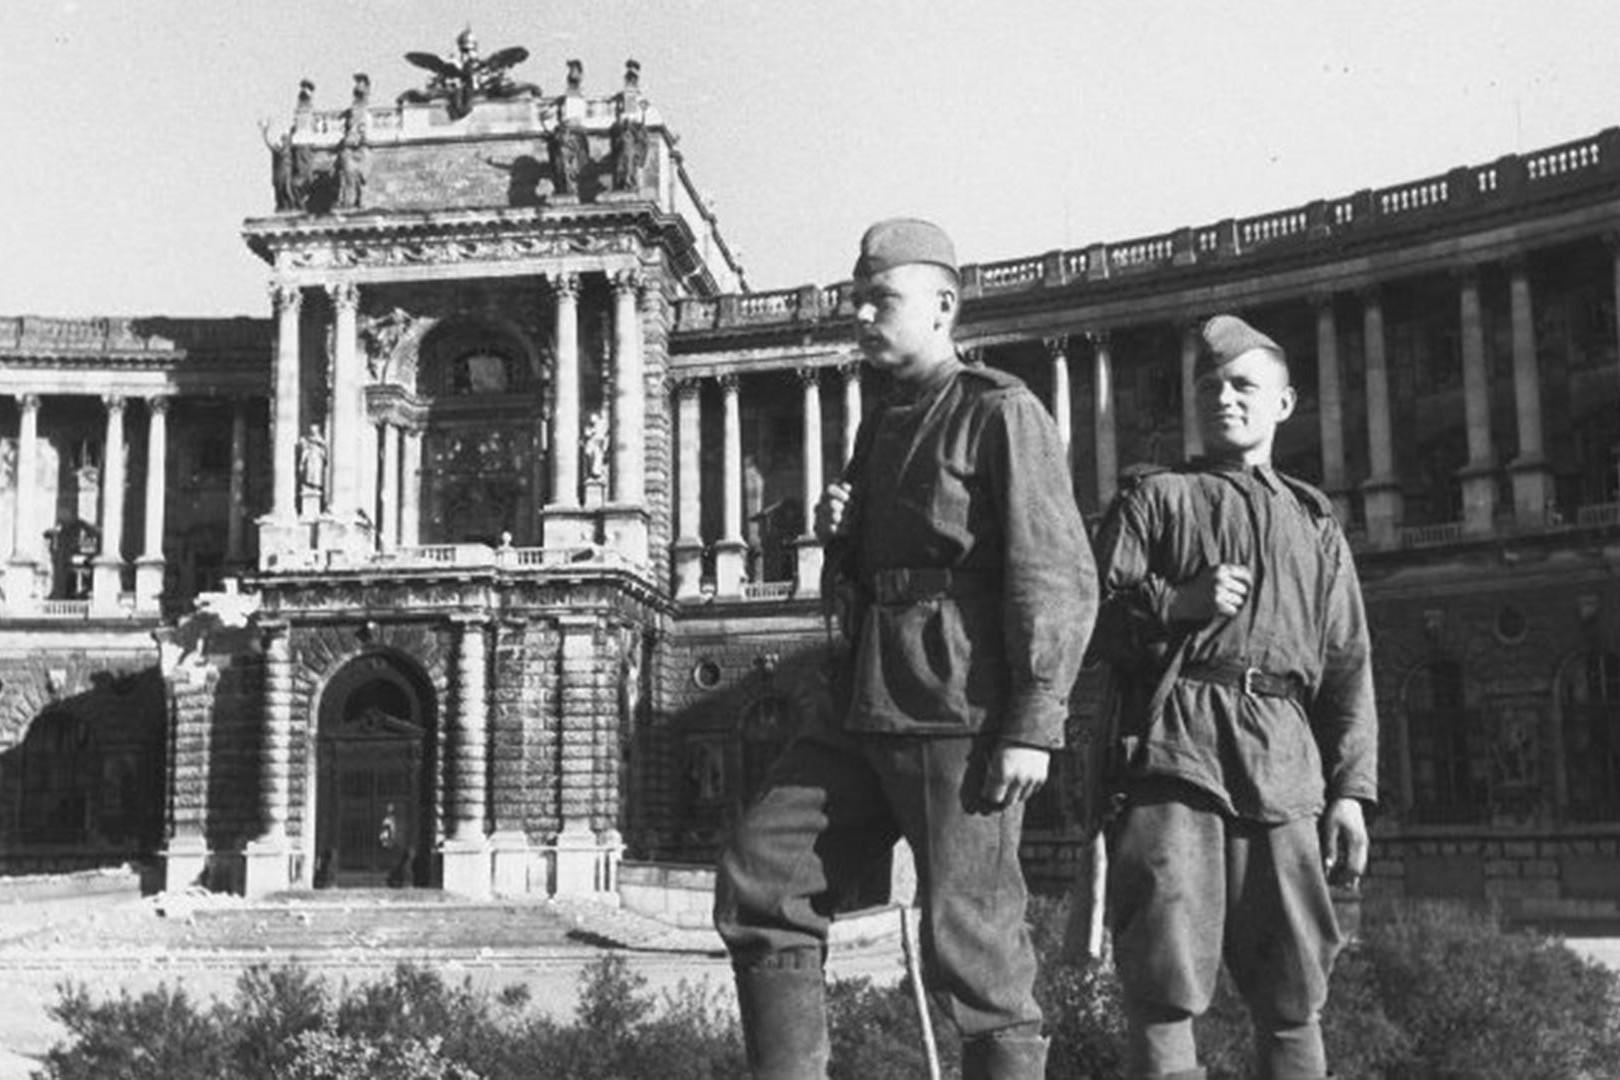 Sovjetski vojnici ispred palate Hofburg u Beču (Foto: Yevgeny Khaldei/MAMM/MDF)